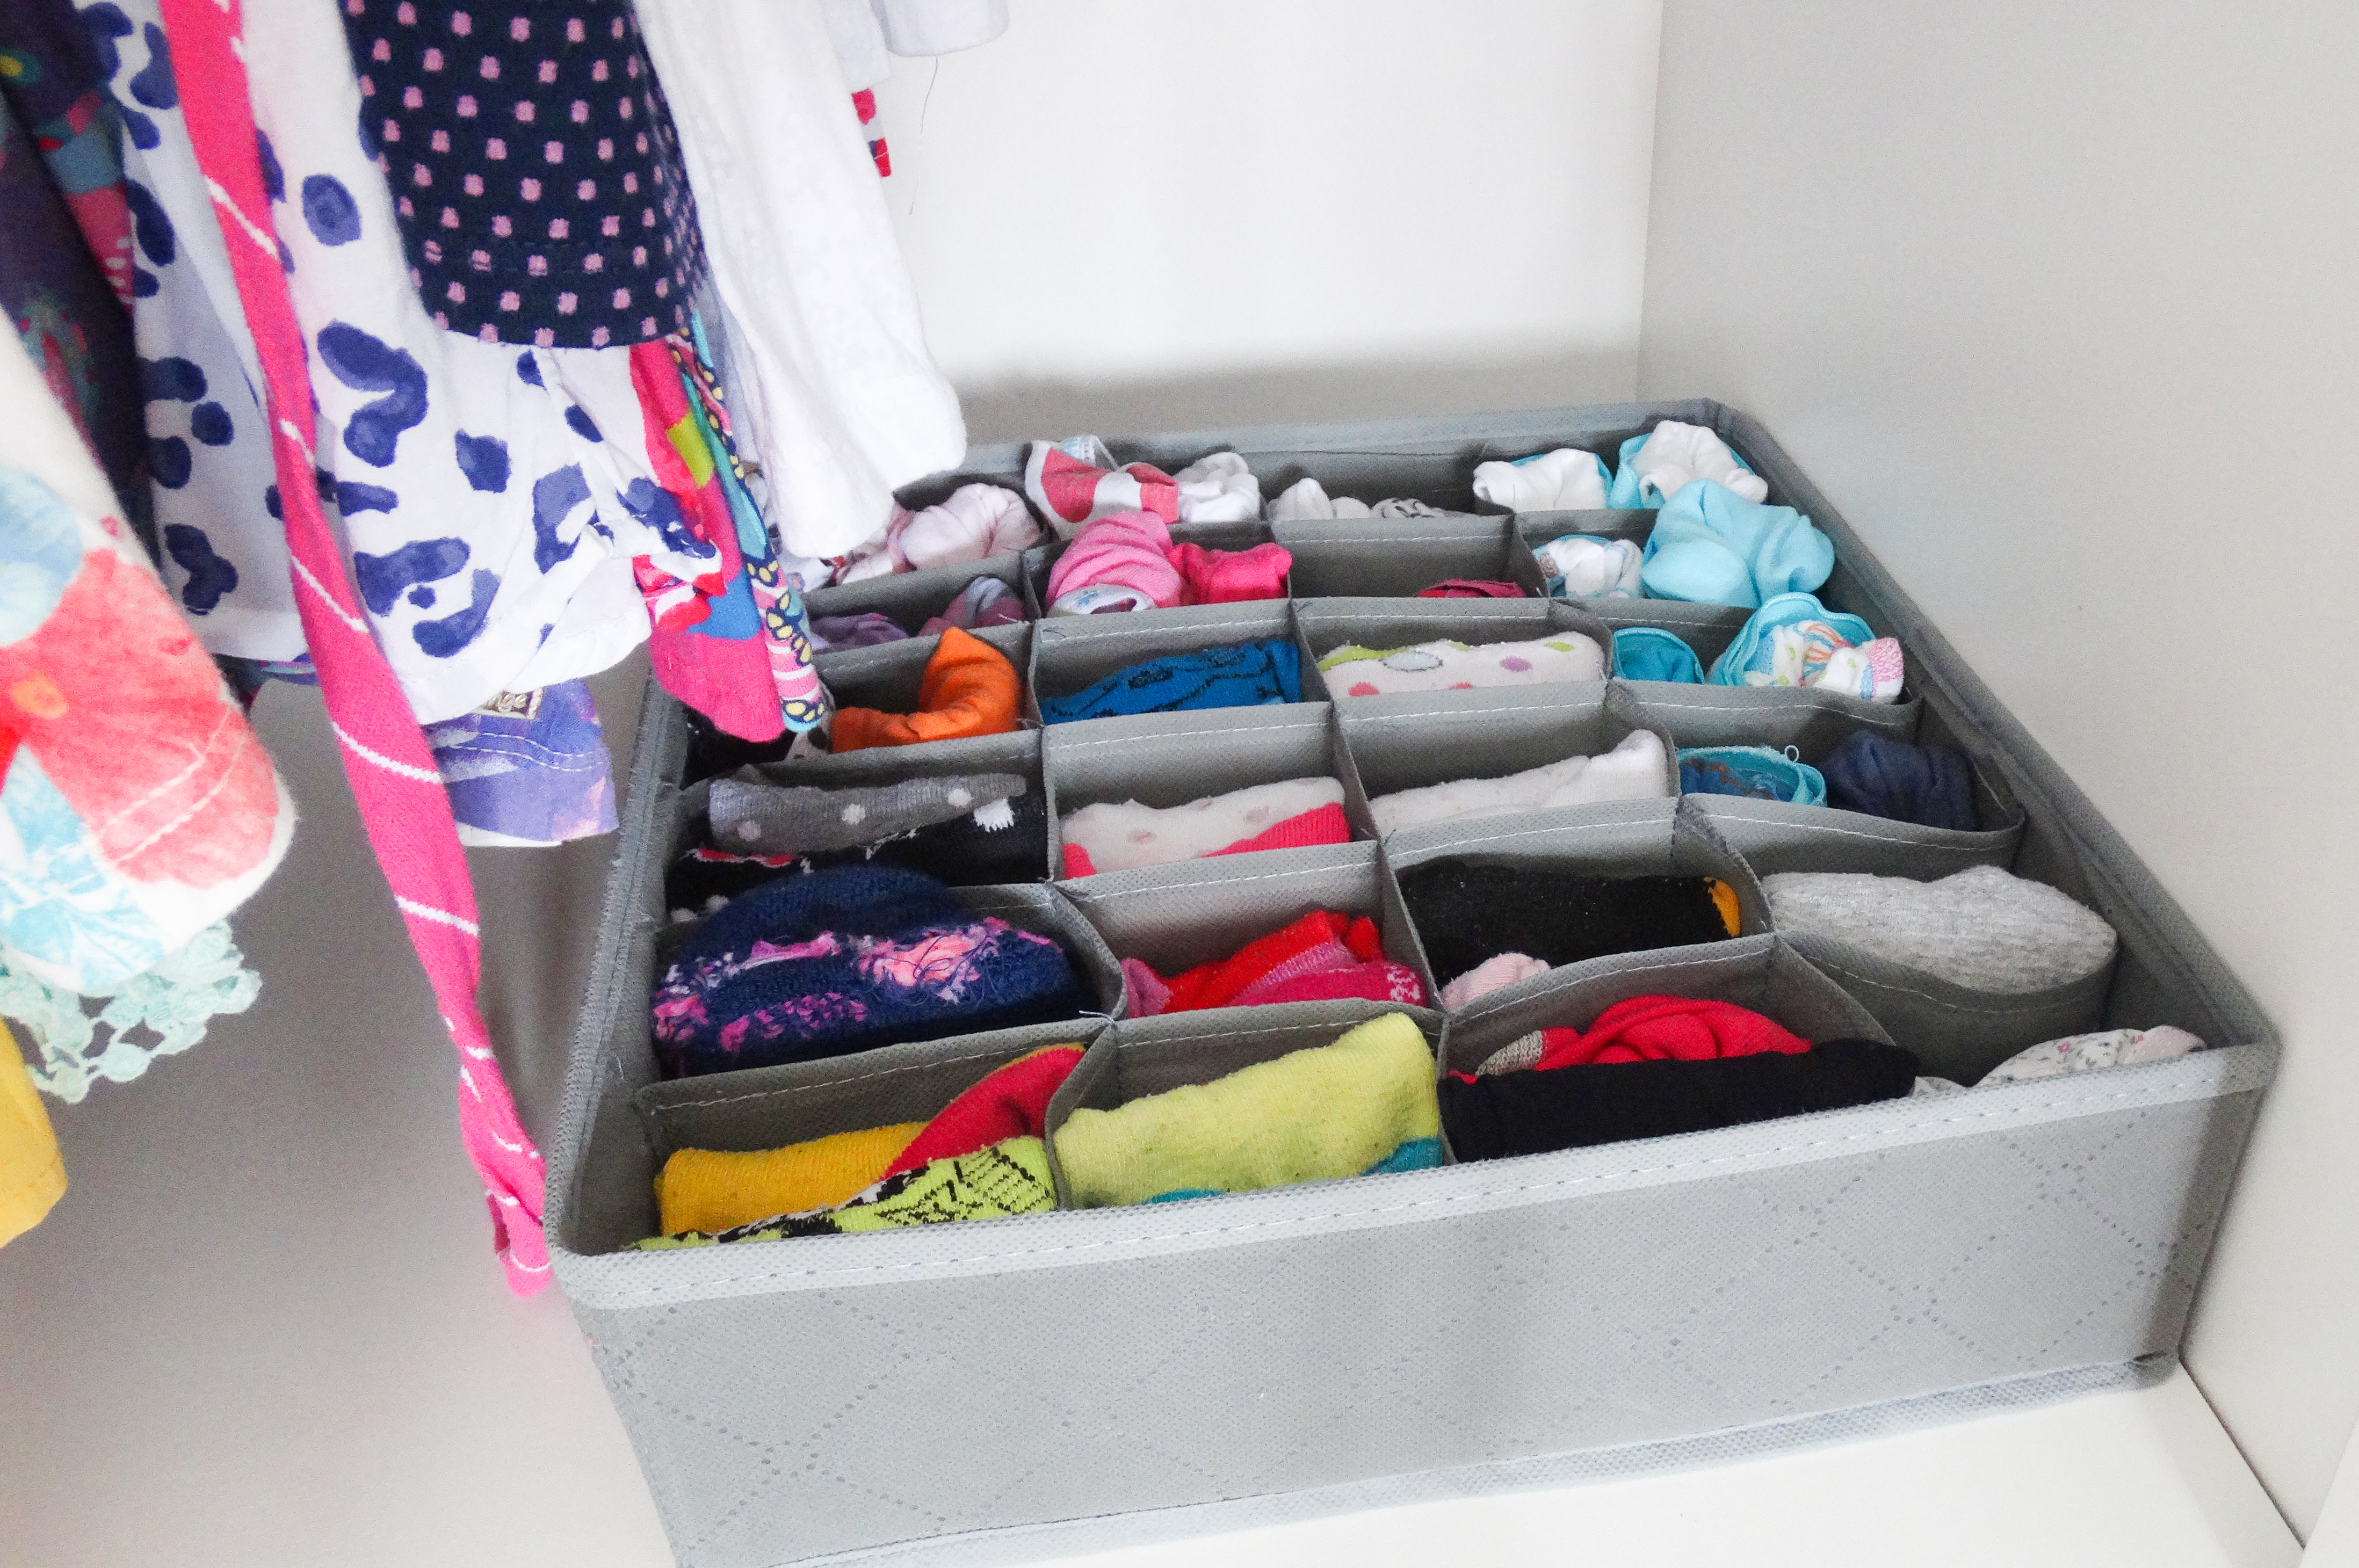 meias  - armario organizado